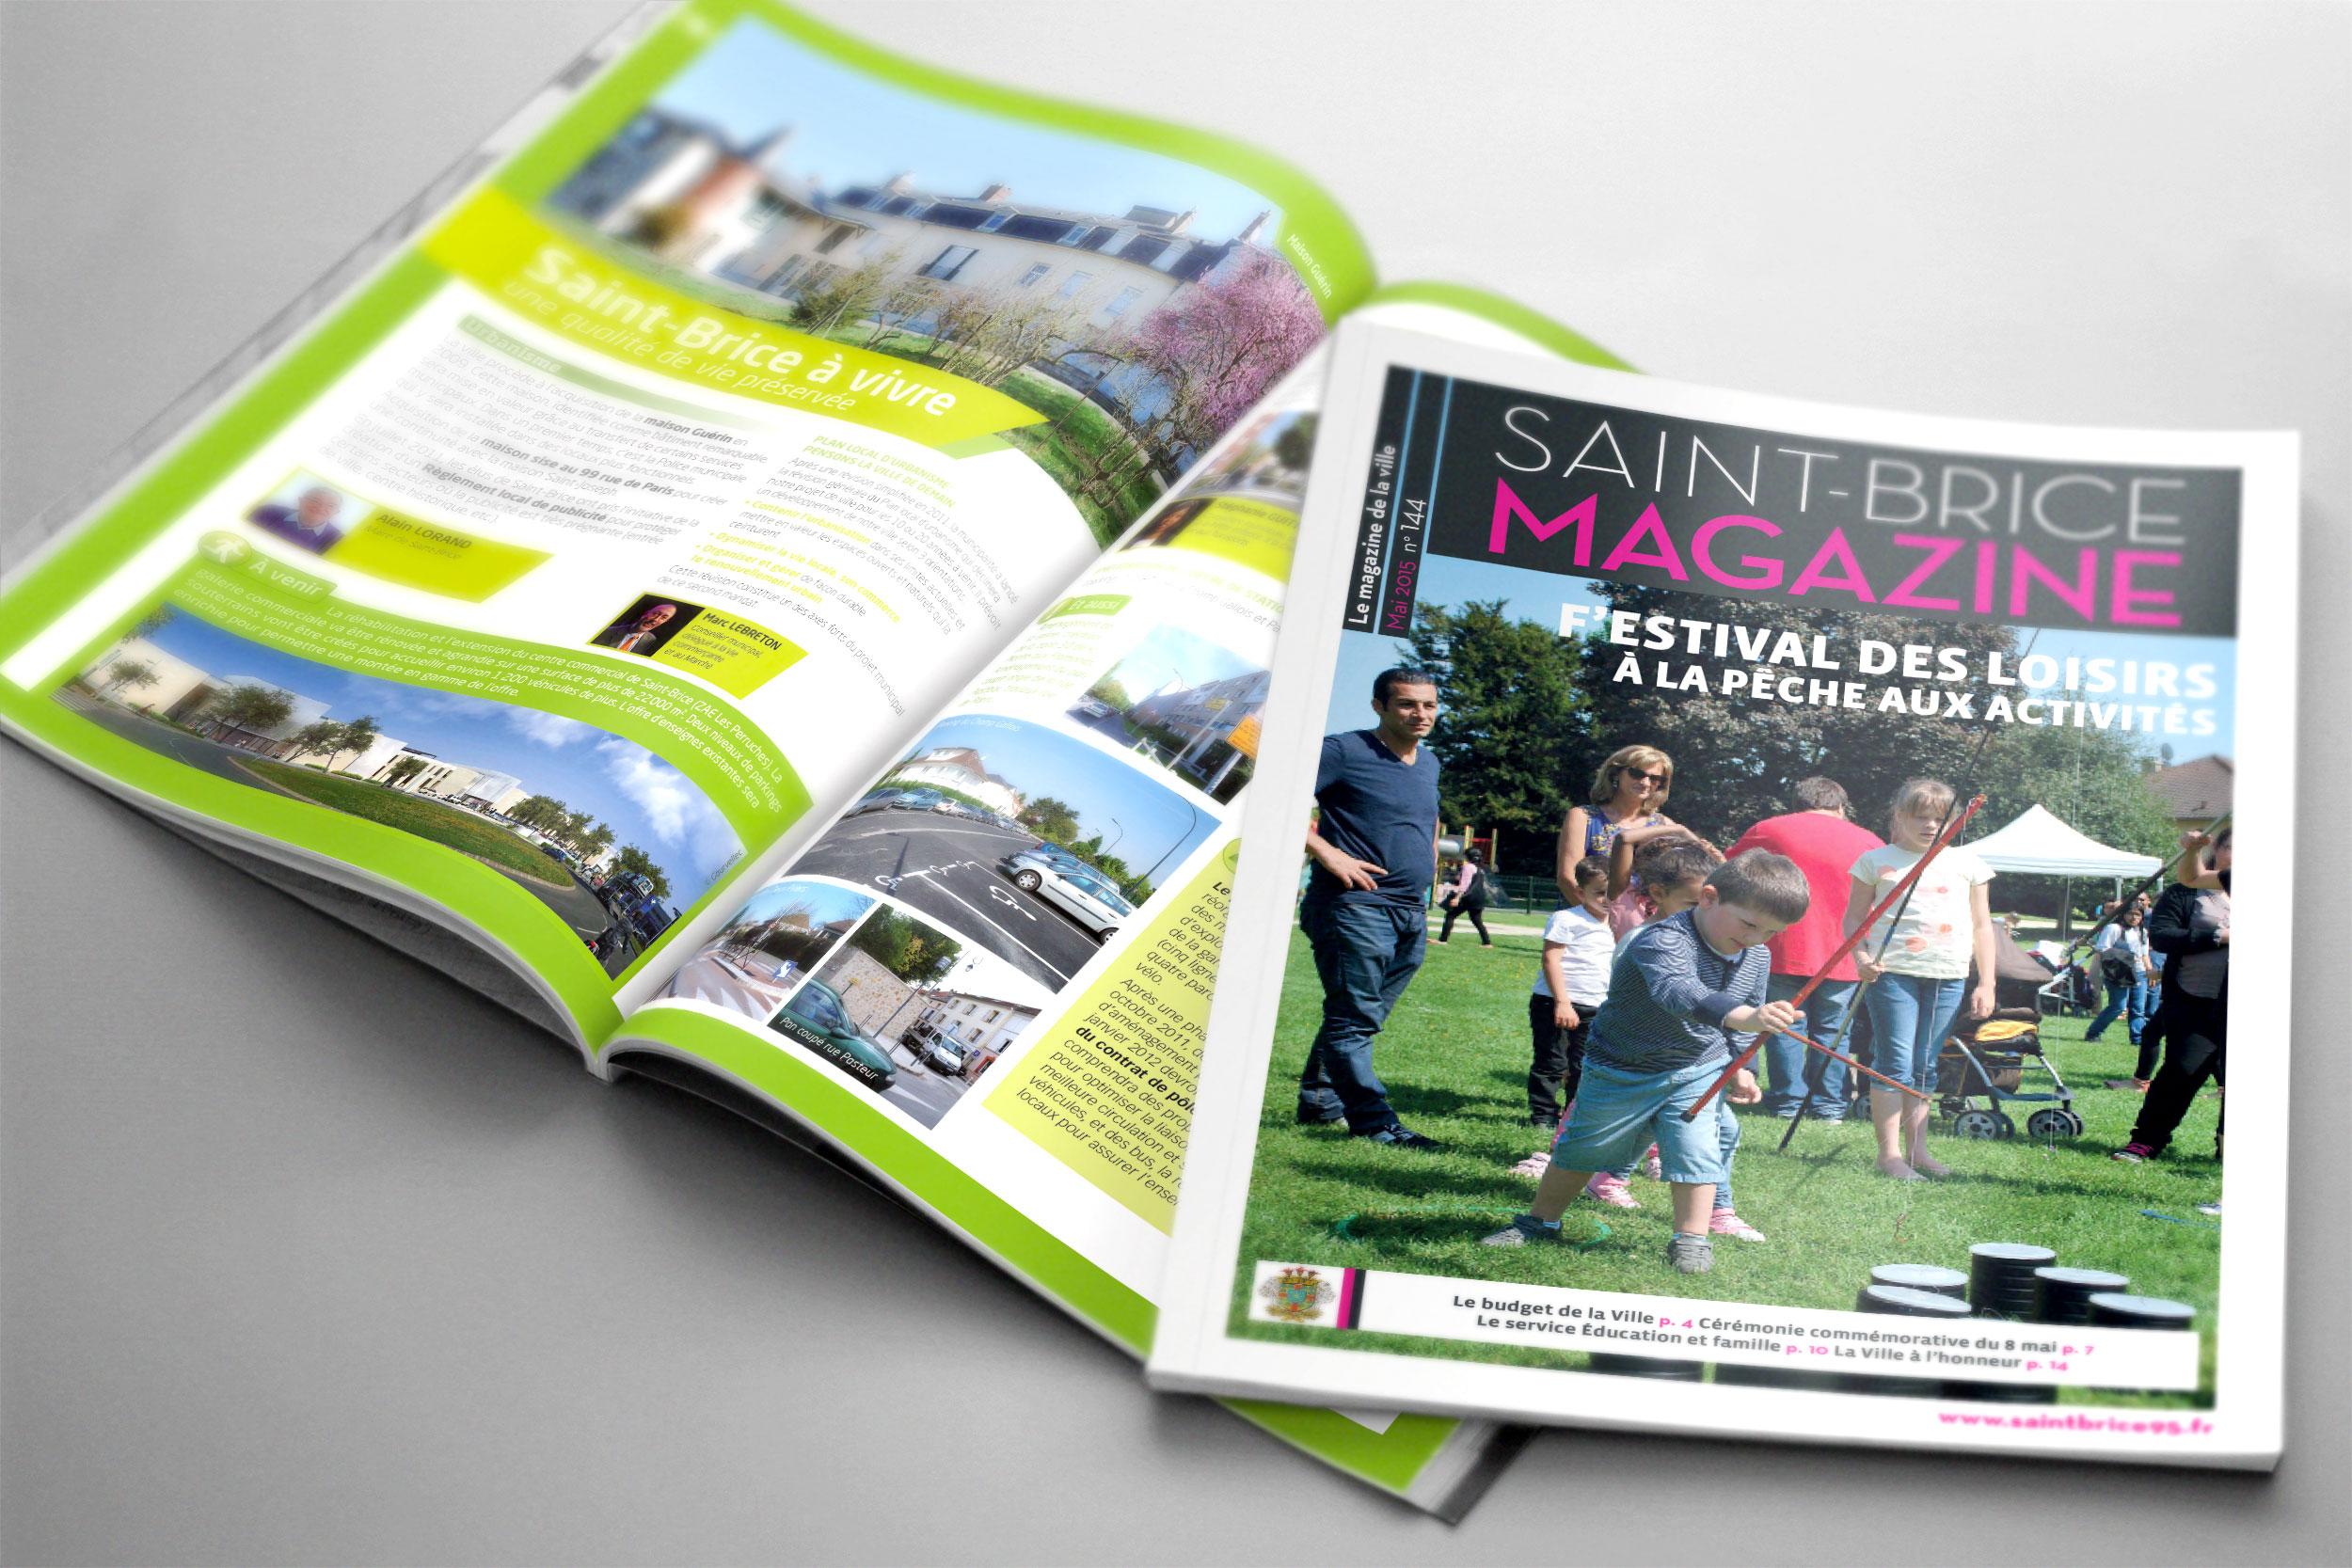 magazine municipal «Saint-Brice mag»